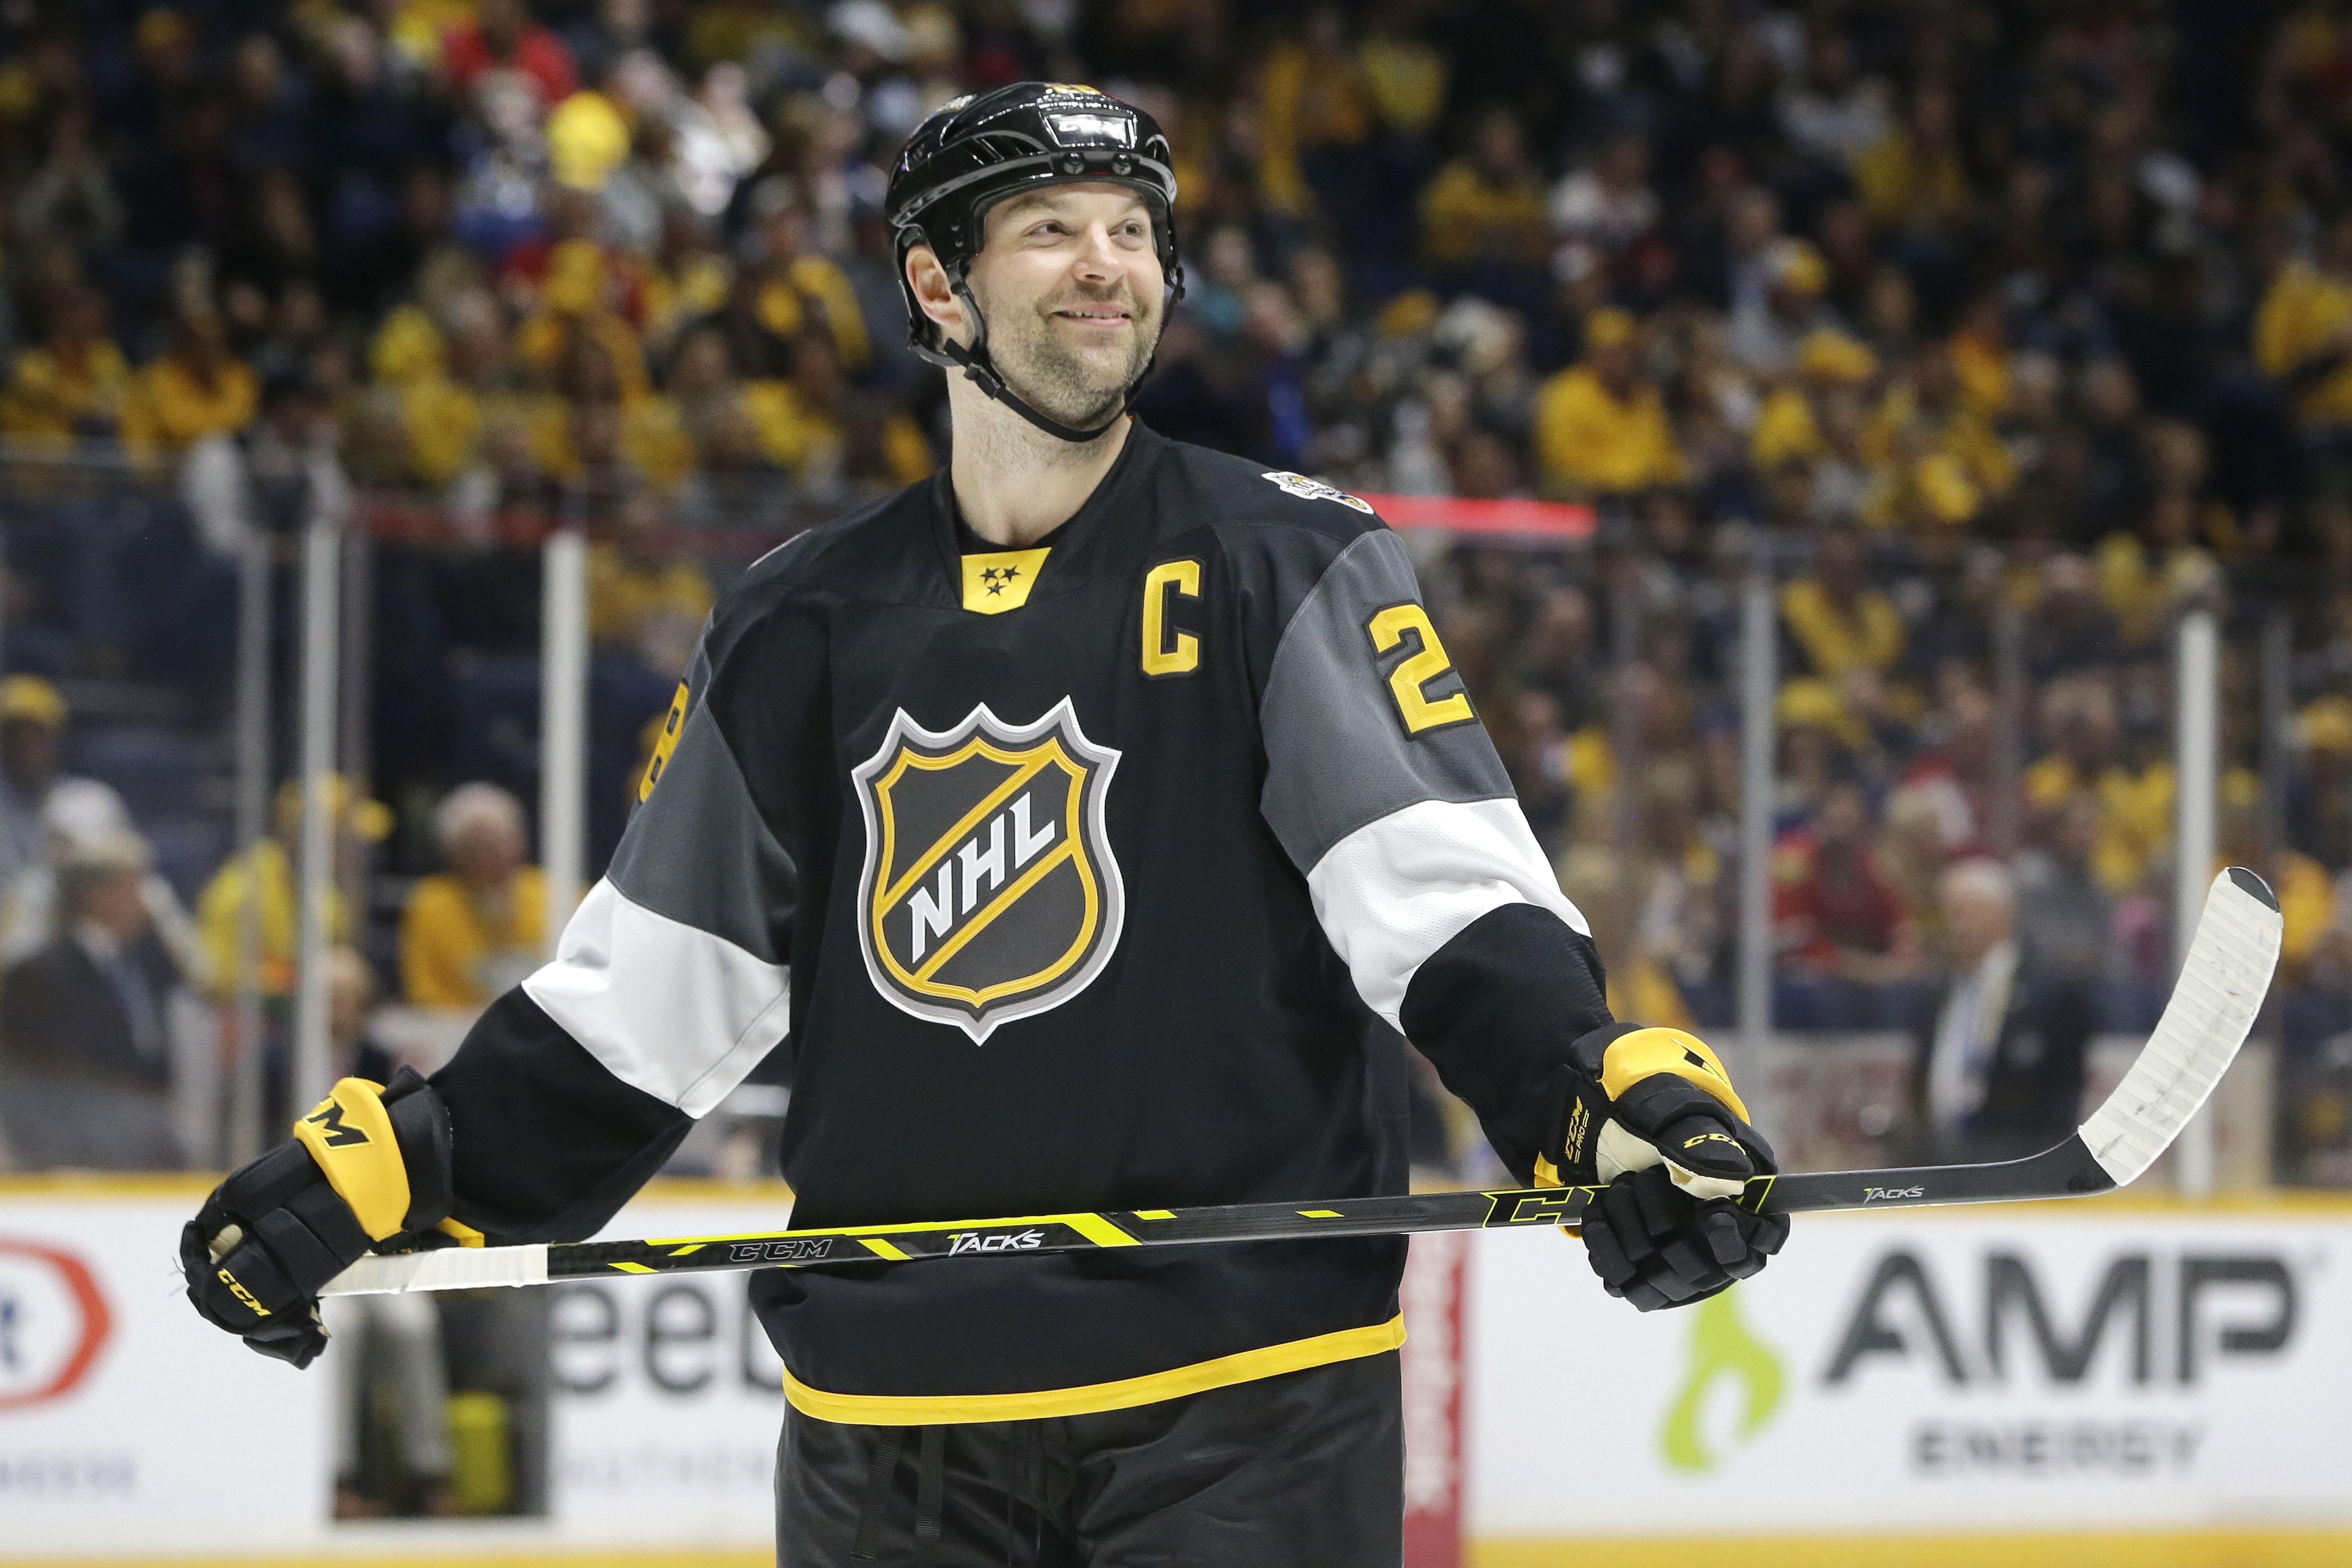 John Scott gets MVP at NHL All-Star Game - CBS News